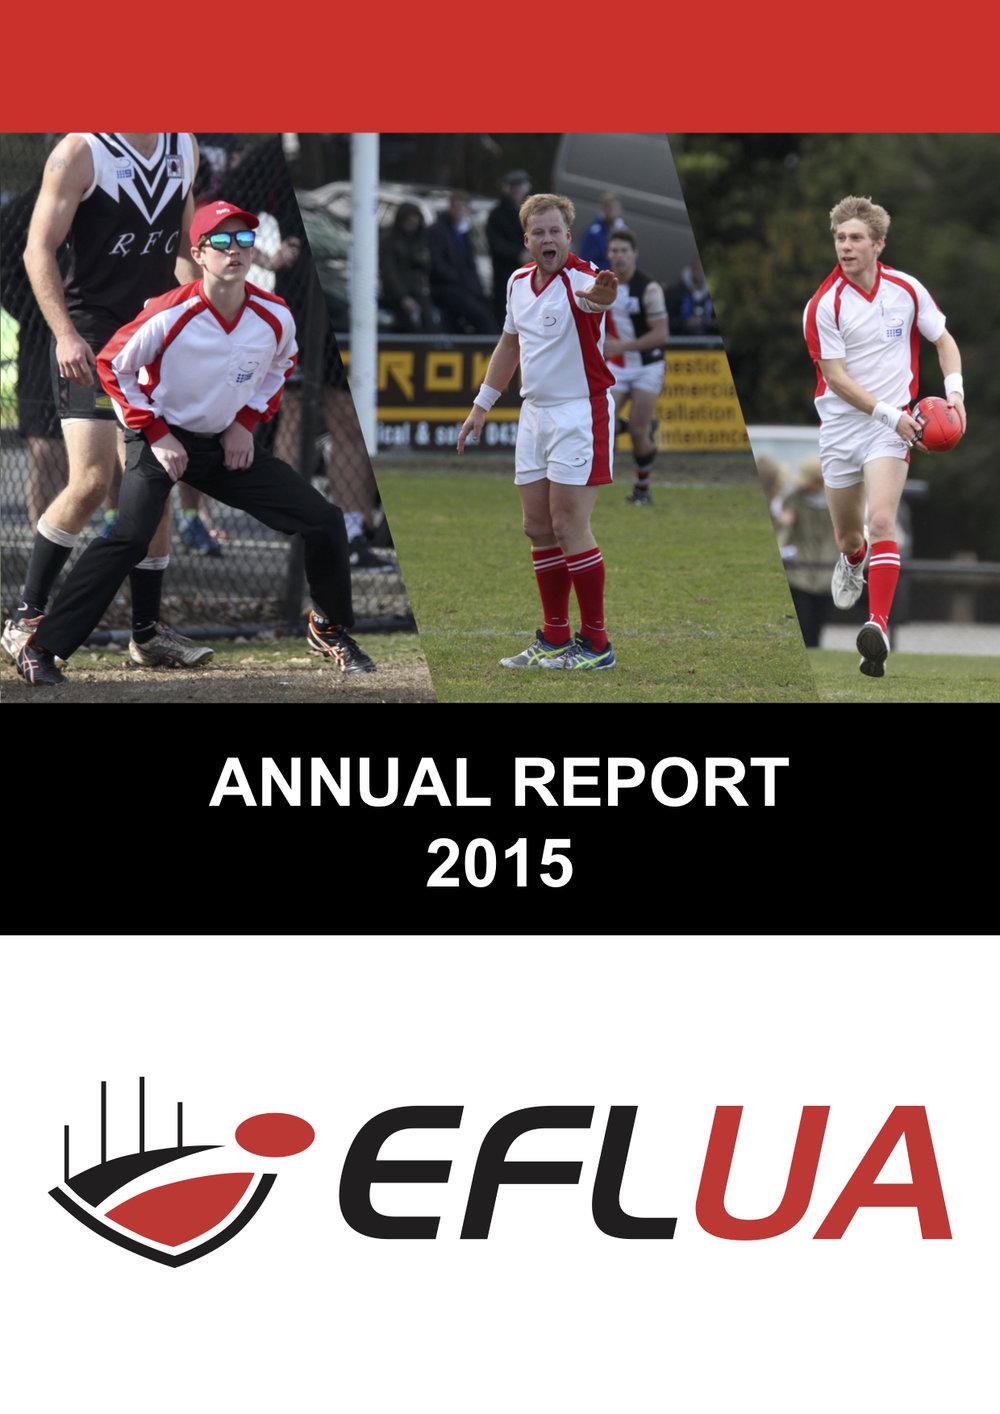 2015 Annual Report IMAGE.jpg